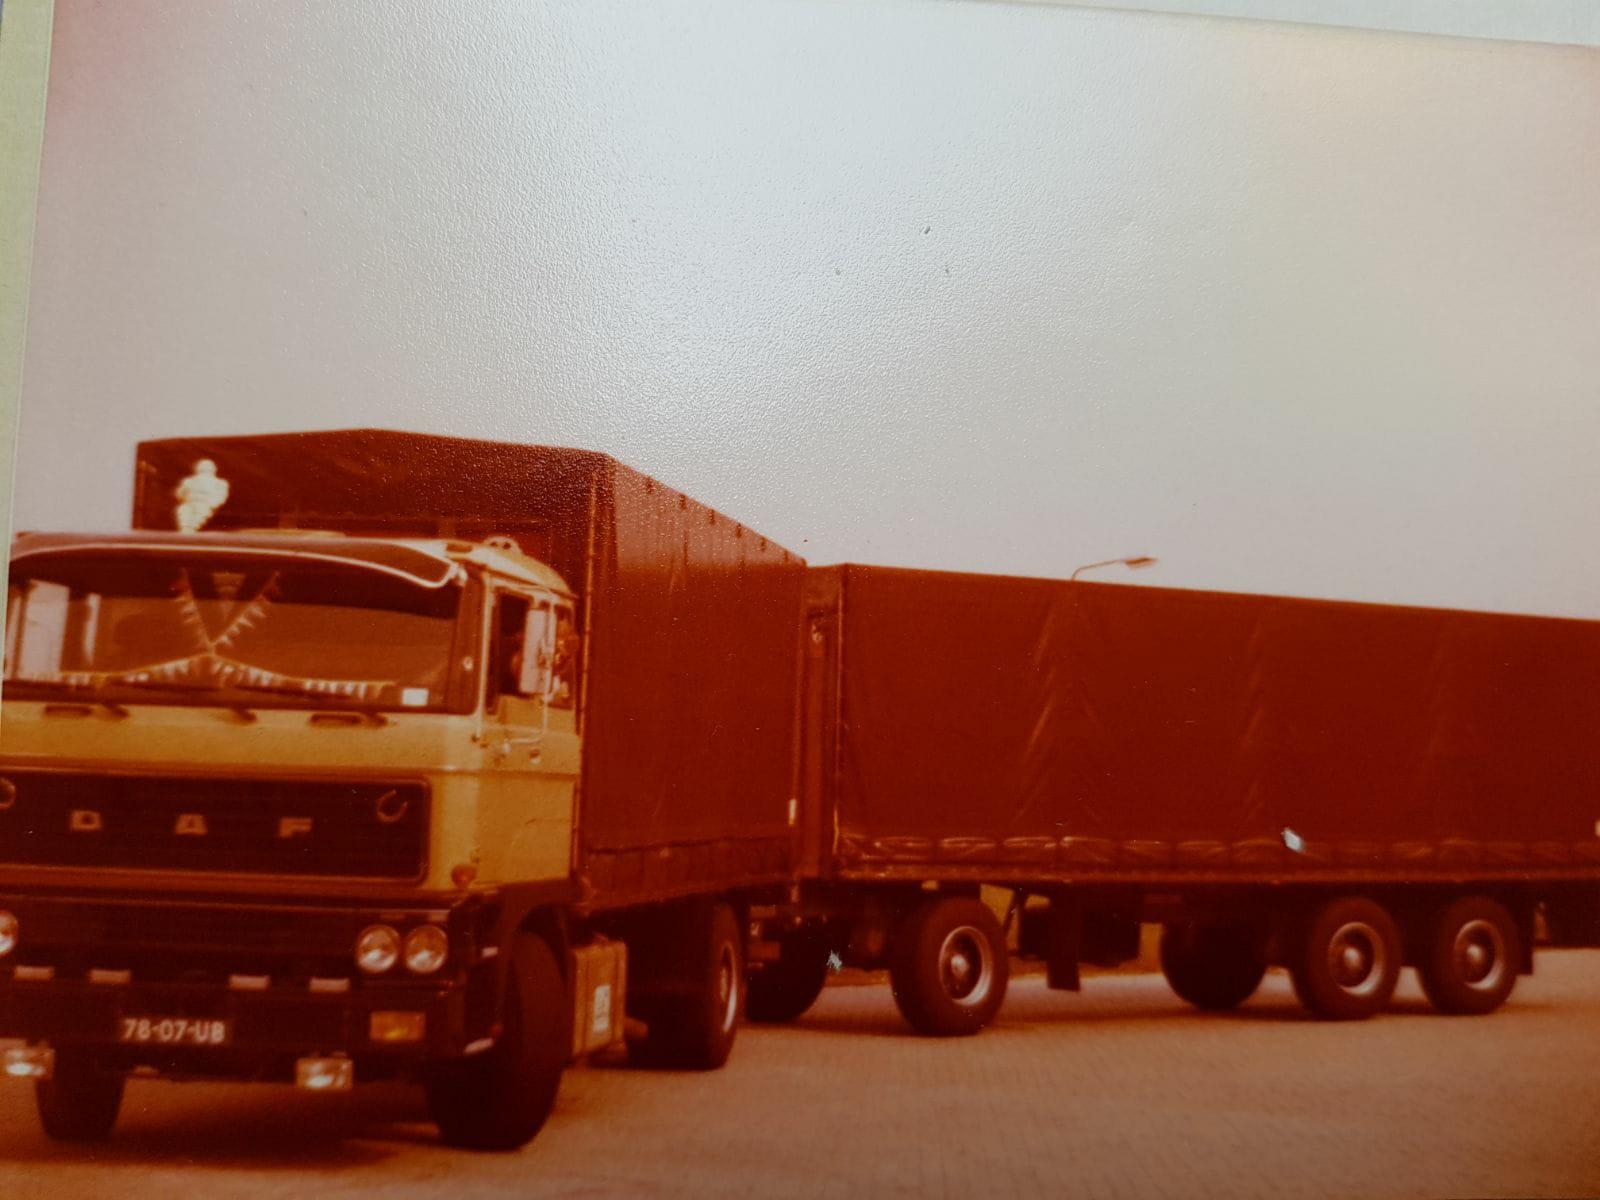 Opa-Boumeester-archief-kleinzoon-Sjenkie-7